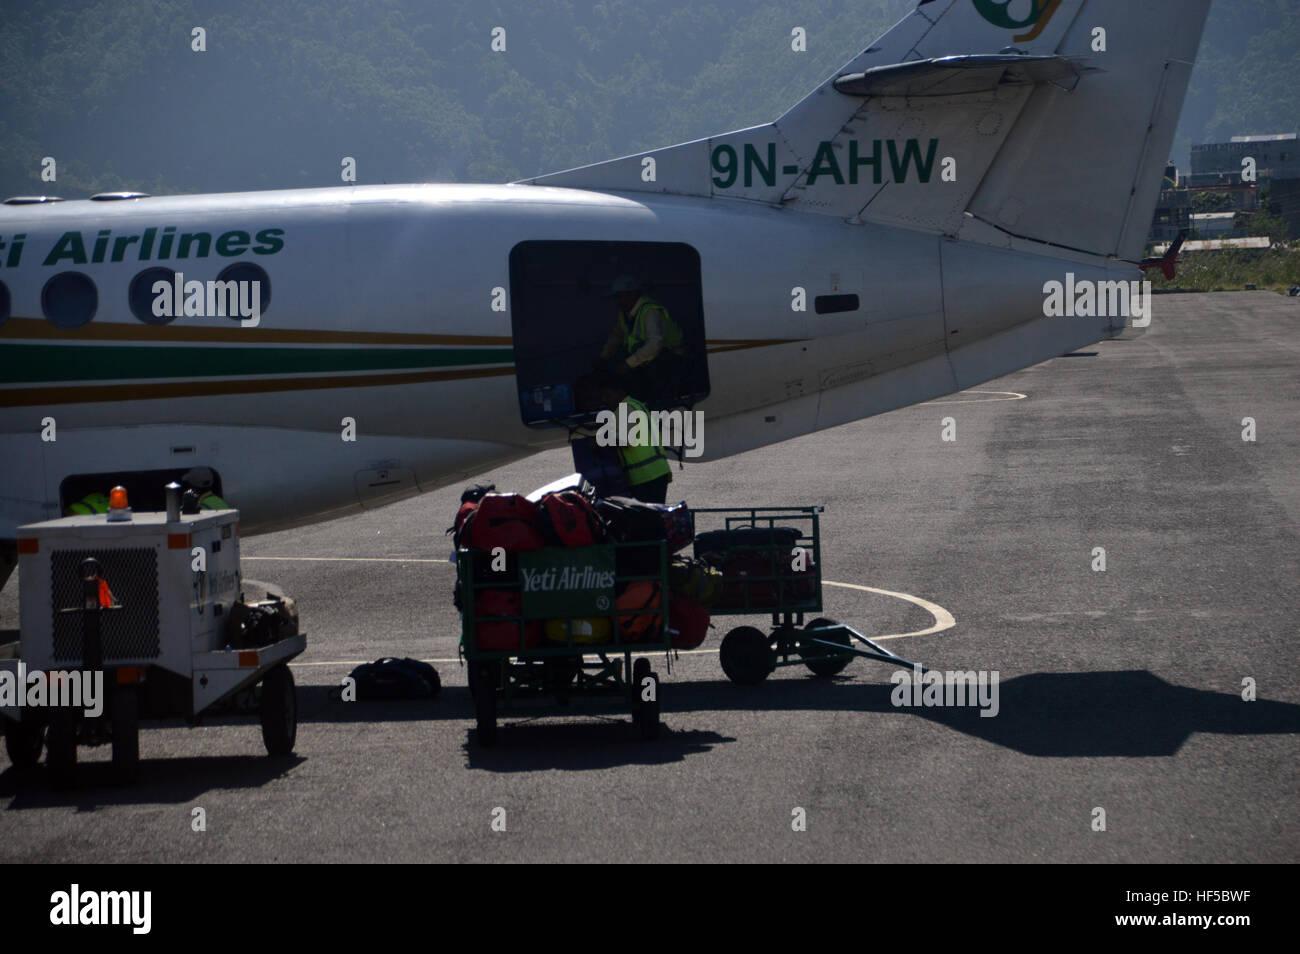 Baggage Handlers on a Jetstream 41Turboprop-powered Plane from Yeti Airlines Flight from Kathmandu to Pokhara, Nepal, - Stock Image